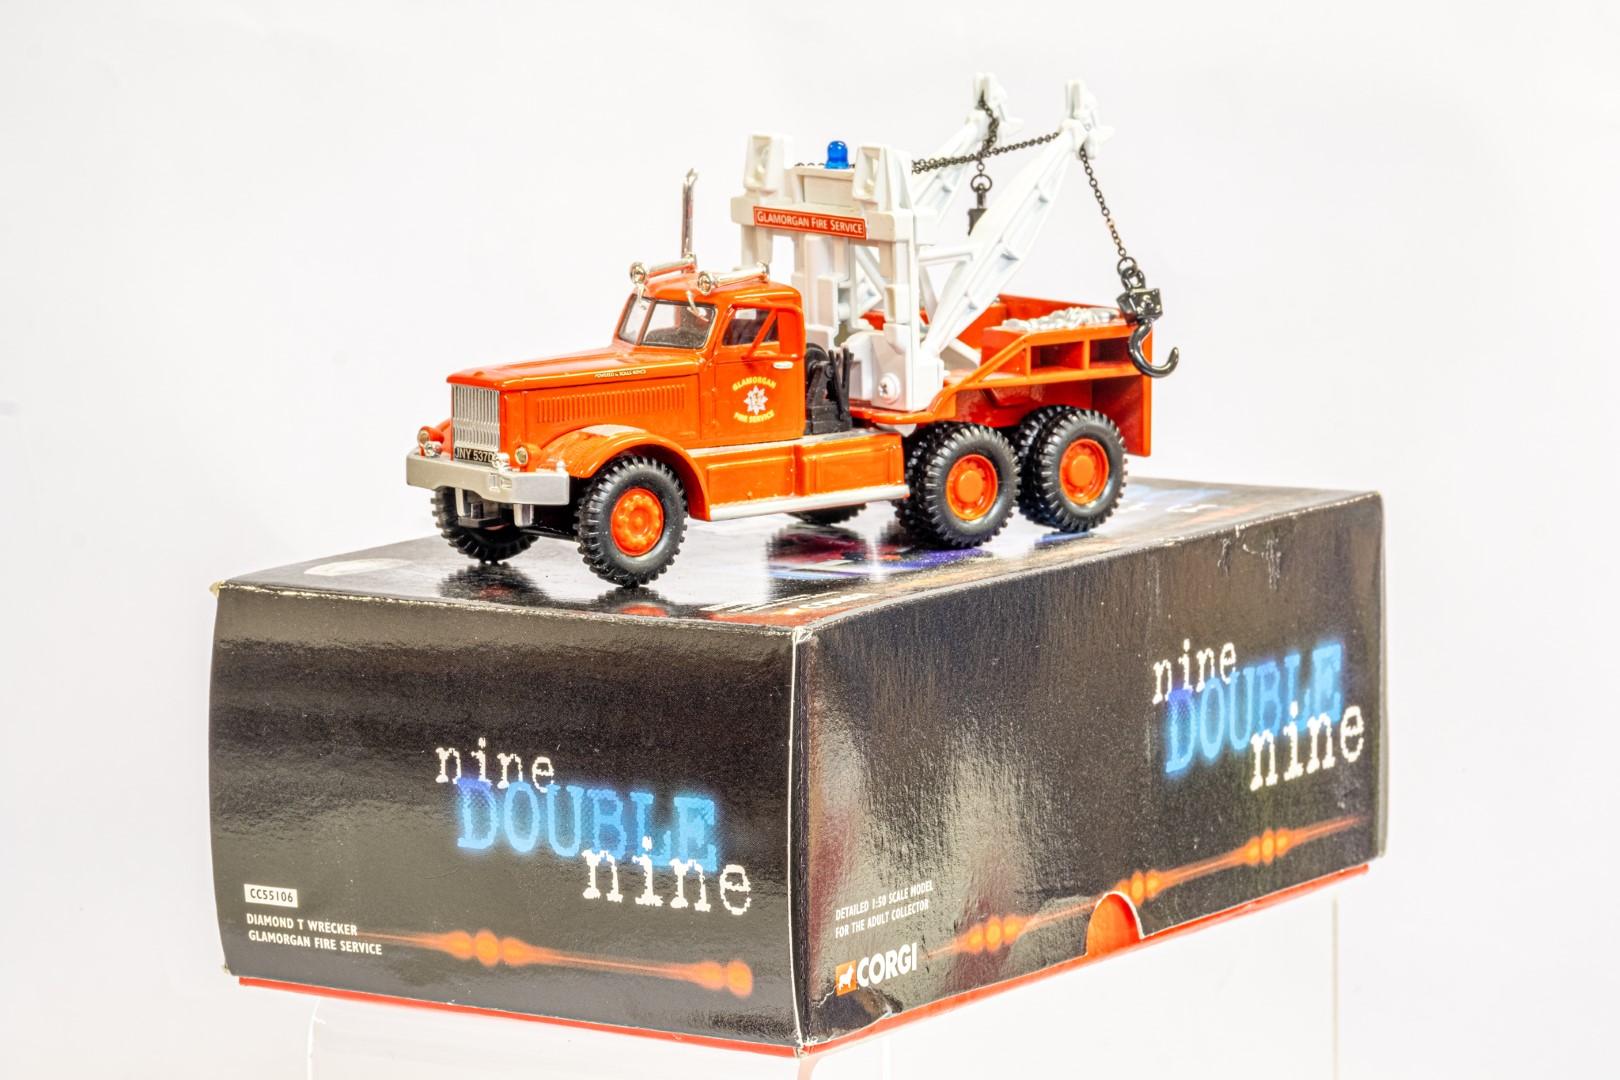 Corgi Diamond T Wrecker - Galmorgan Fire Service - Image 3 of 6